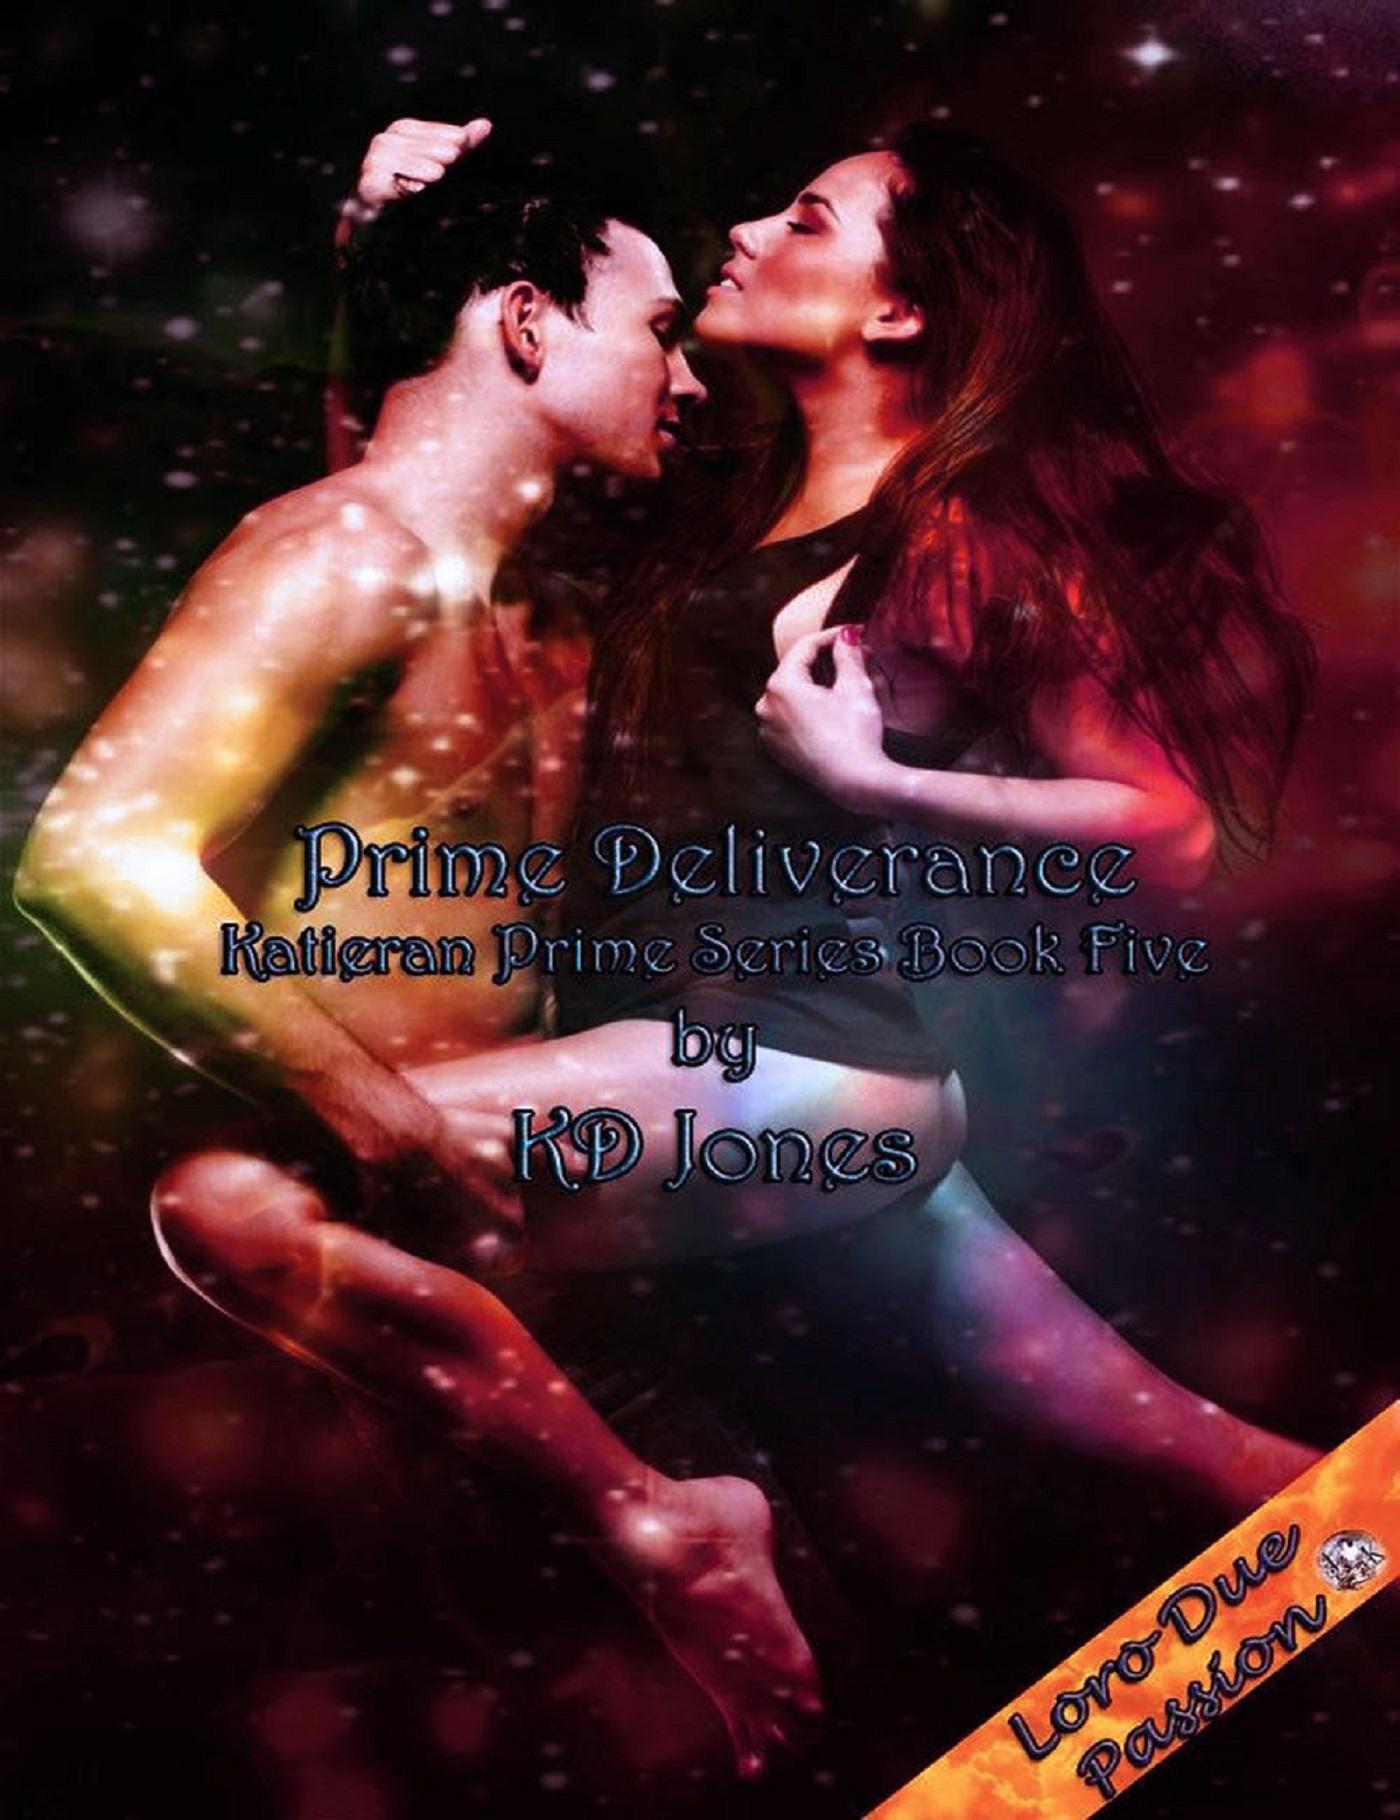 K.D. Jones - Prime Deliverance